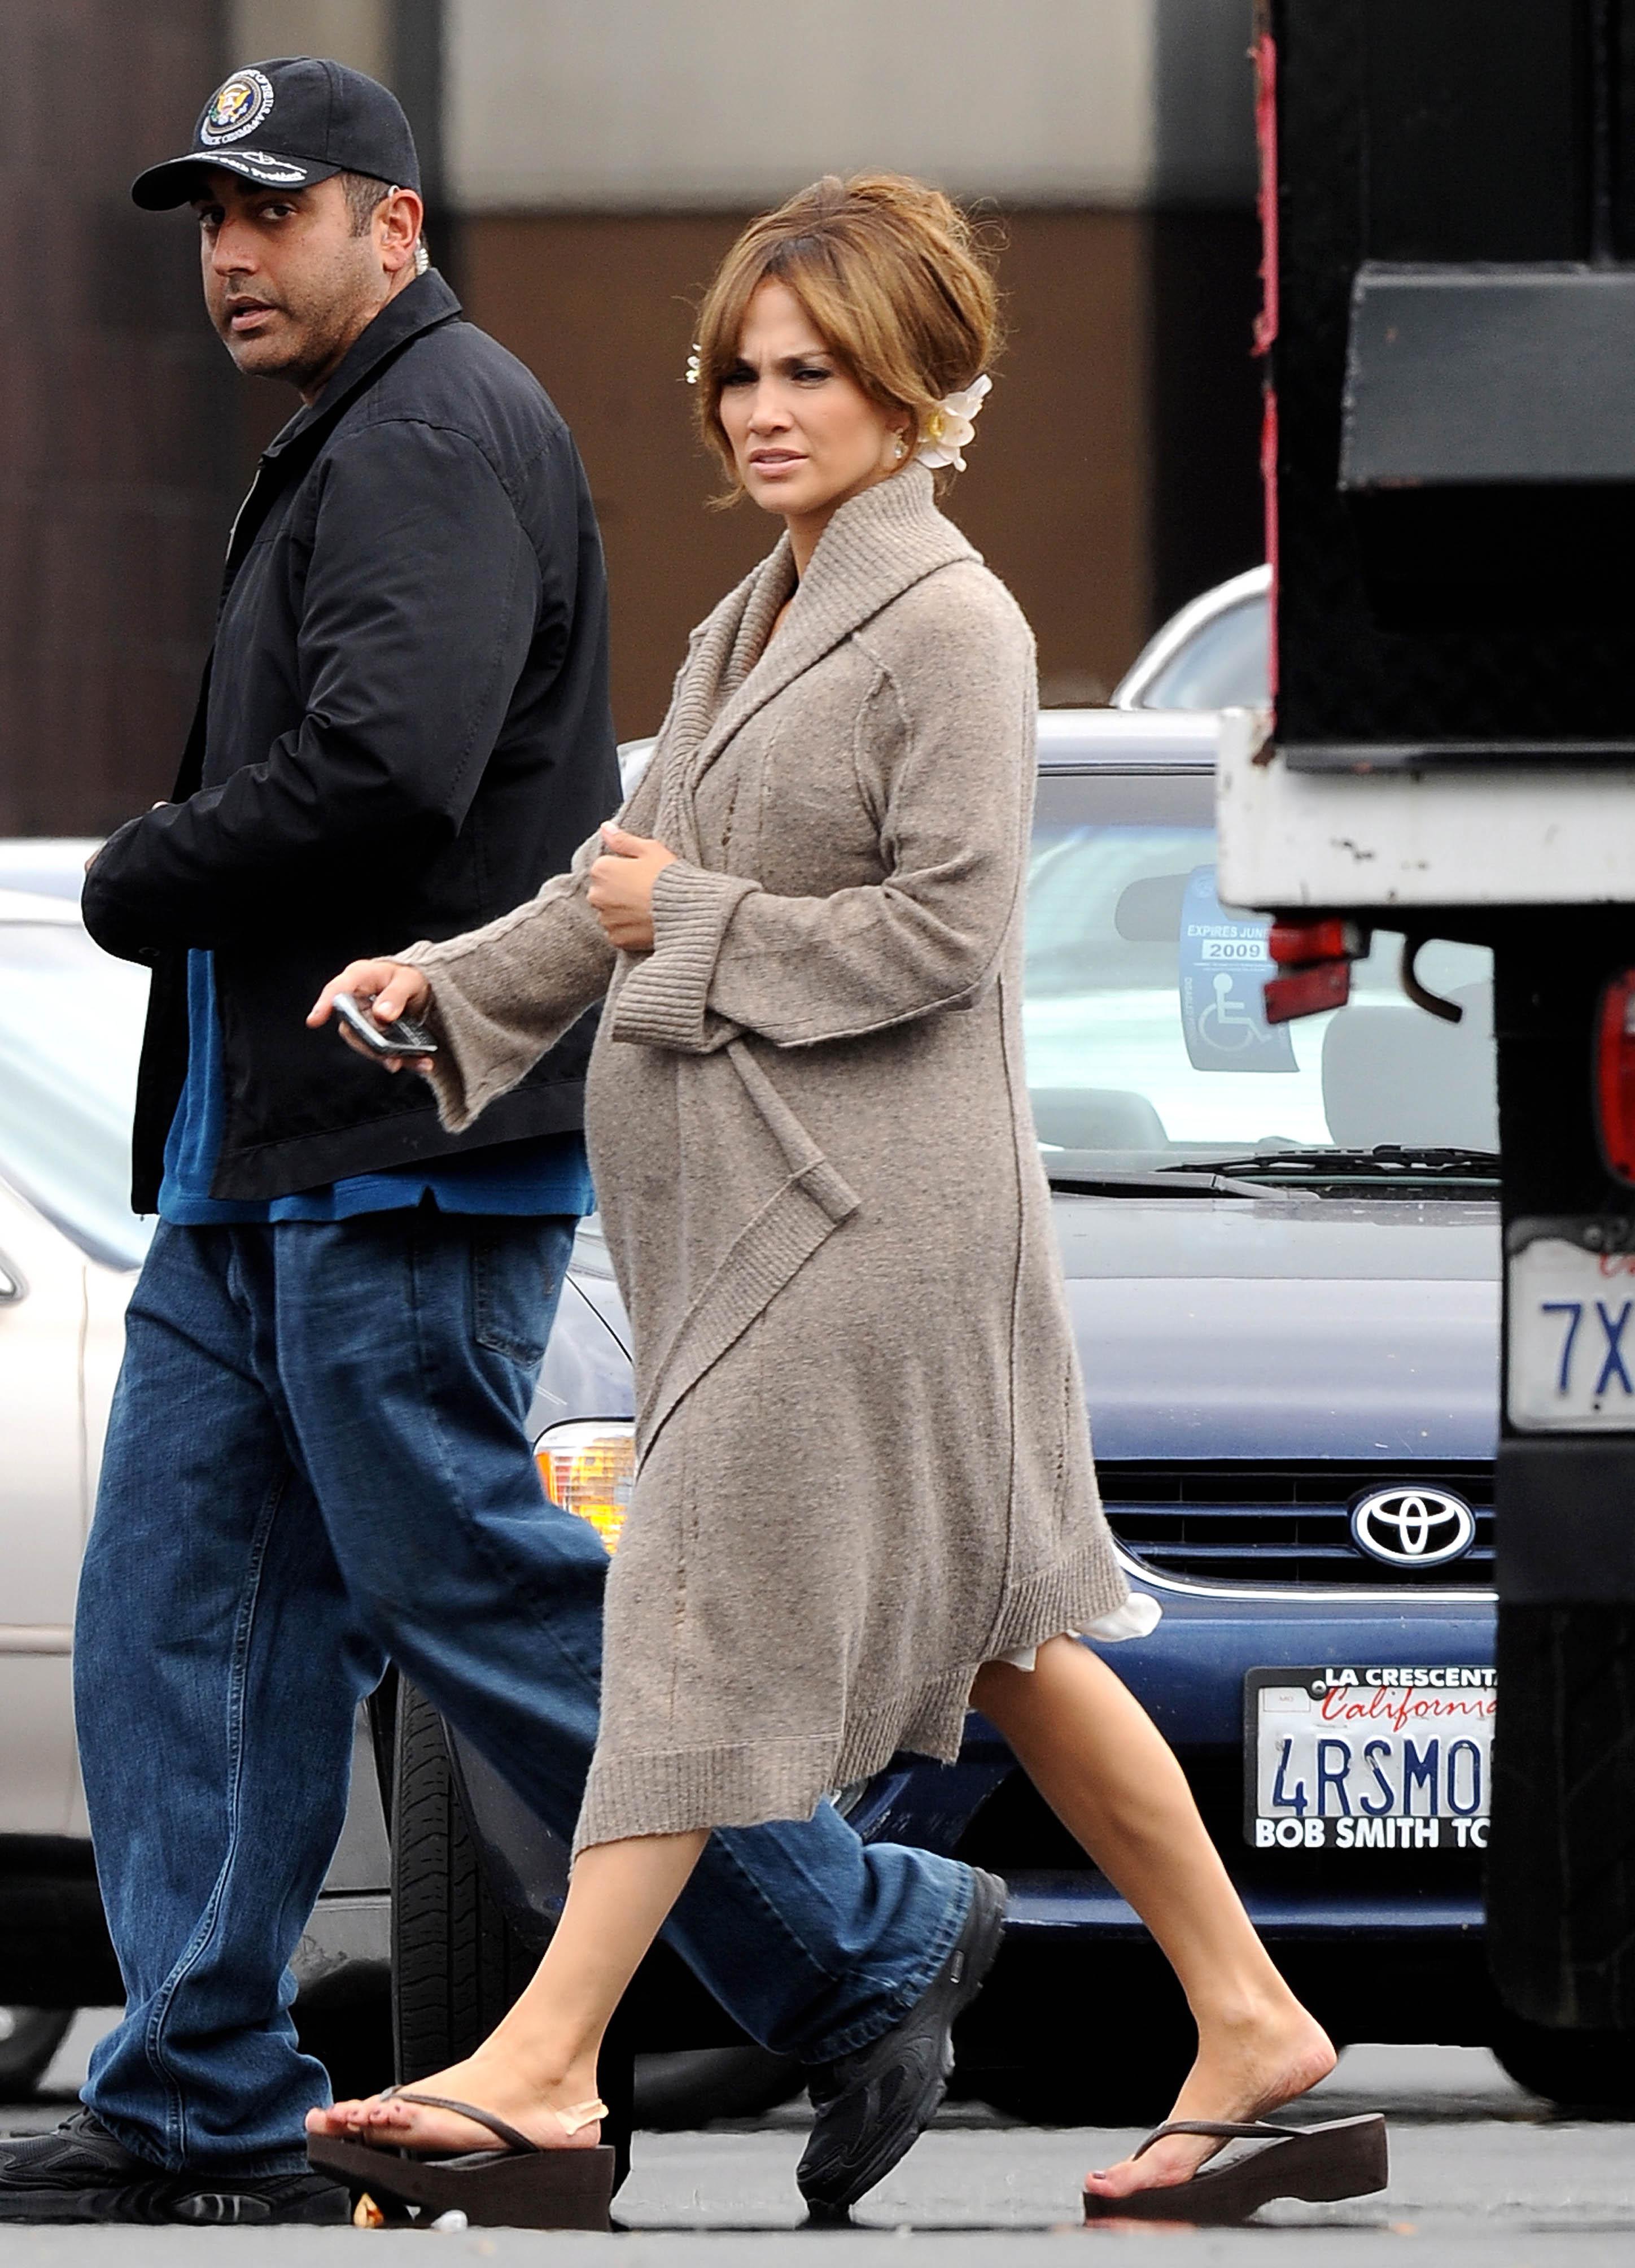 24752_Preppie_-_Jennifer_Lopez_on_The_Back-Up_Plan_set_in_L.A._-_June_15_2009_755_122_421lo.jpg